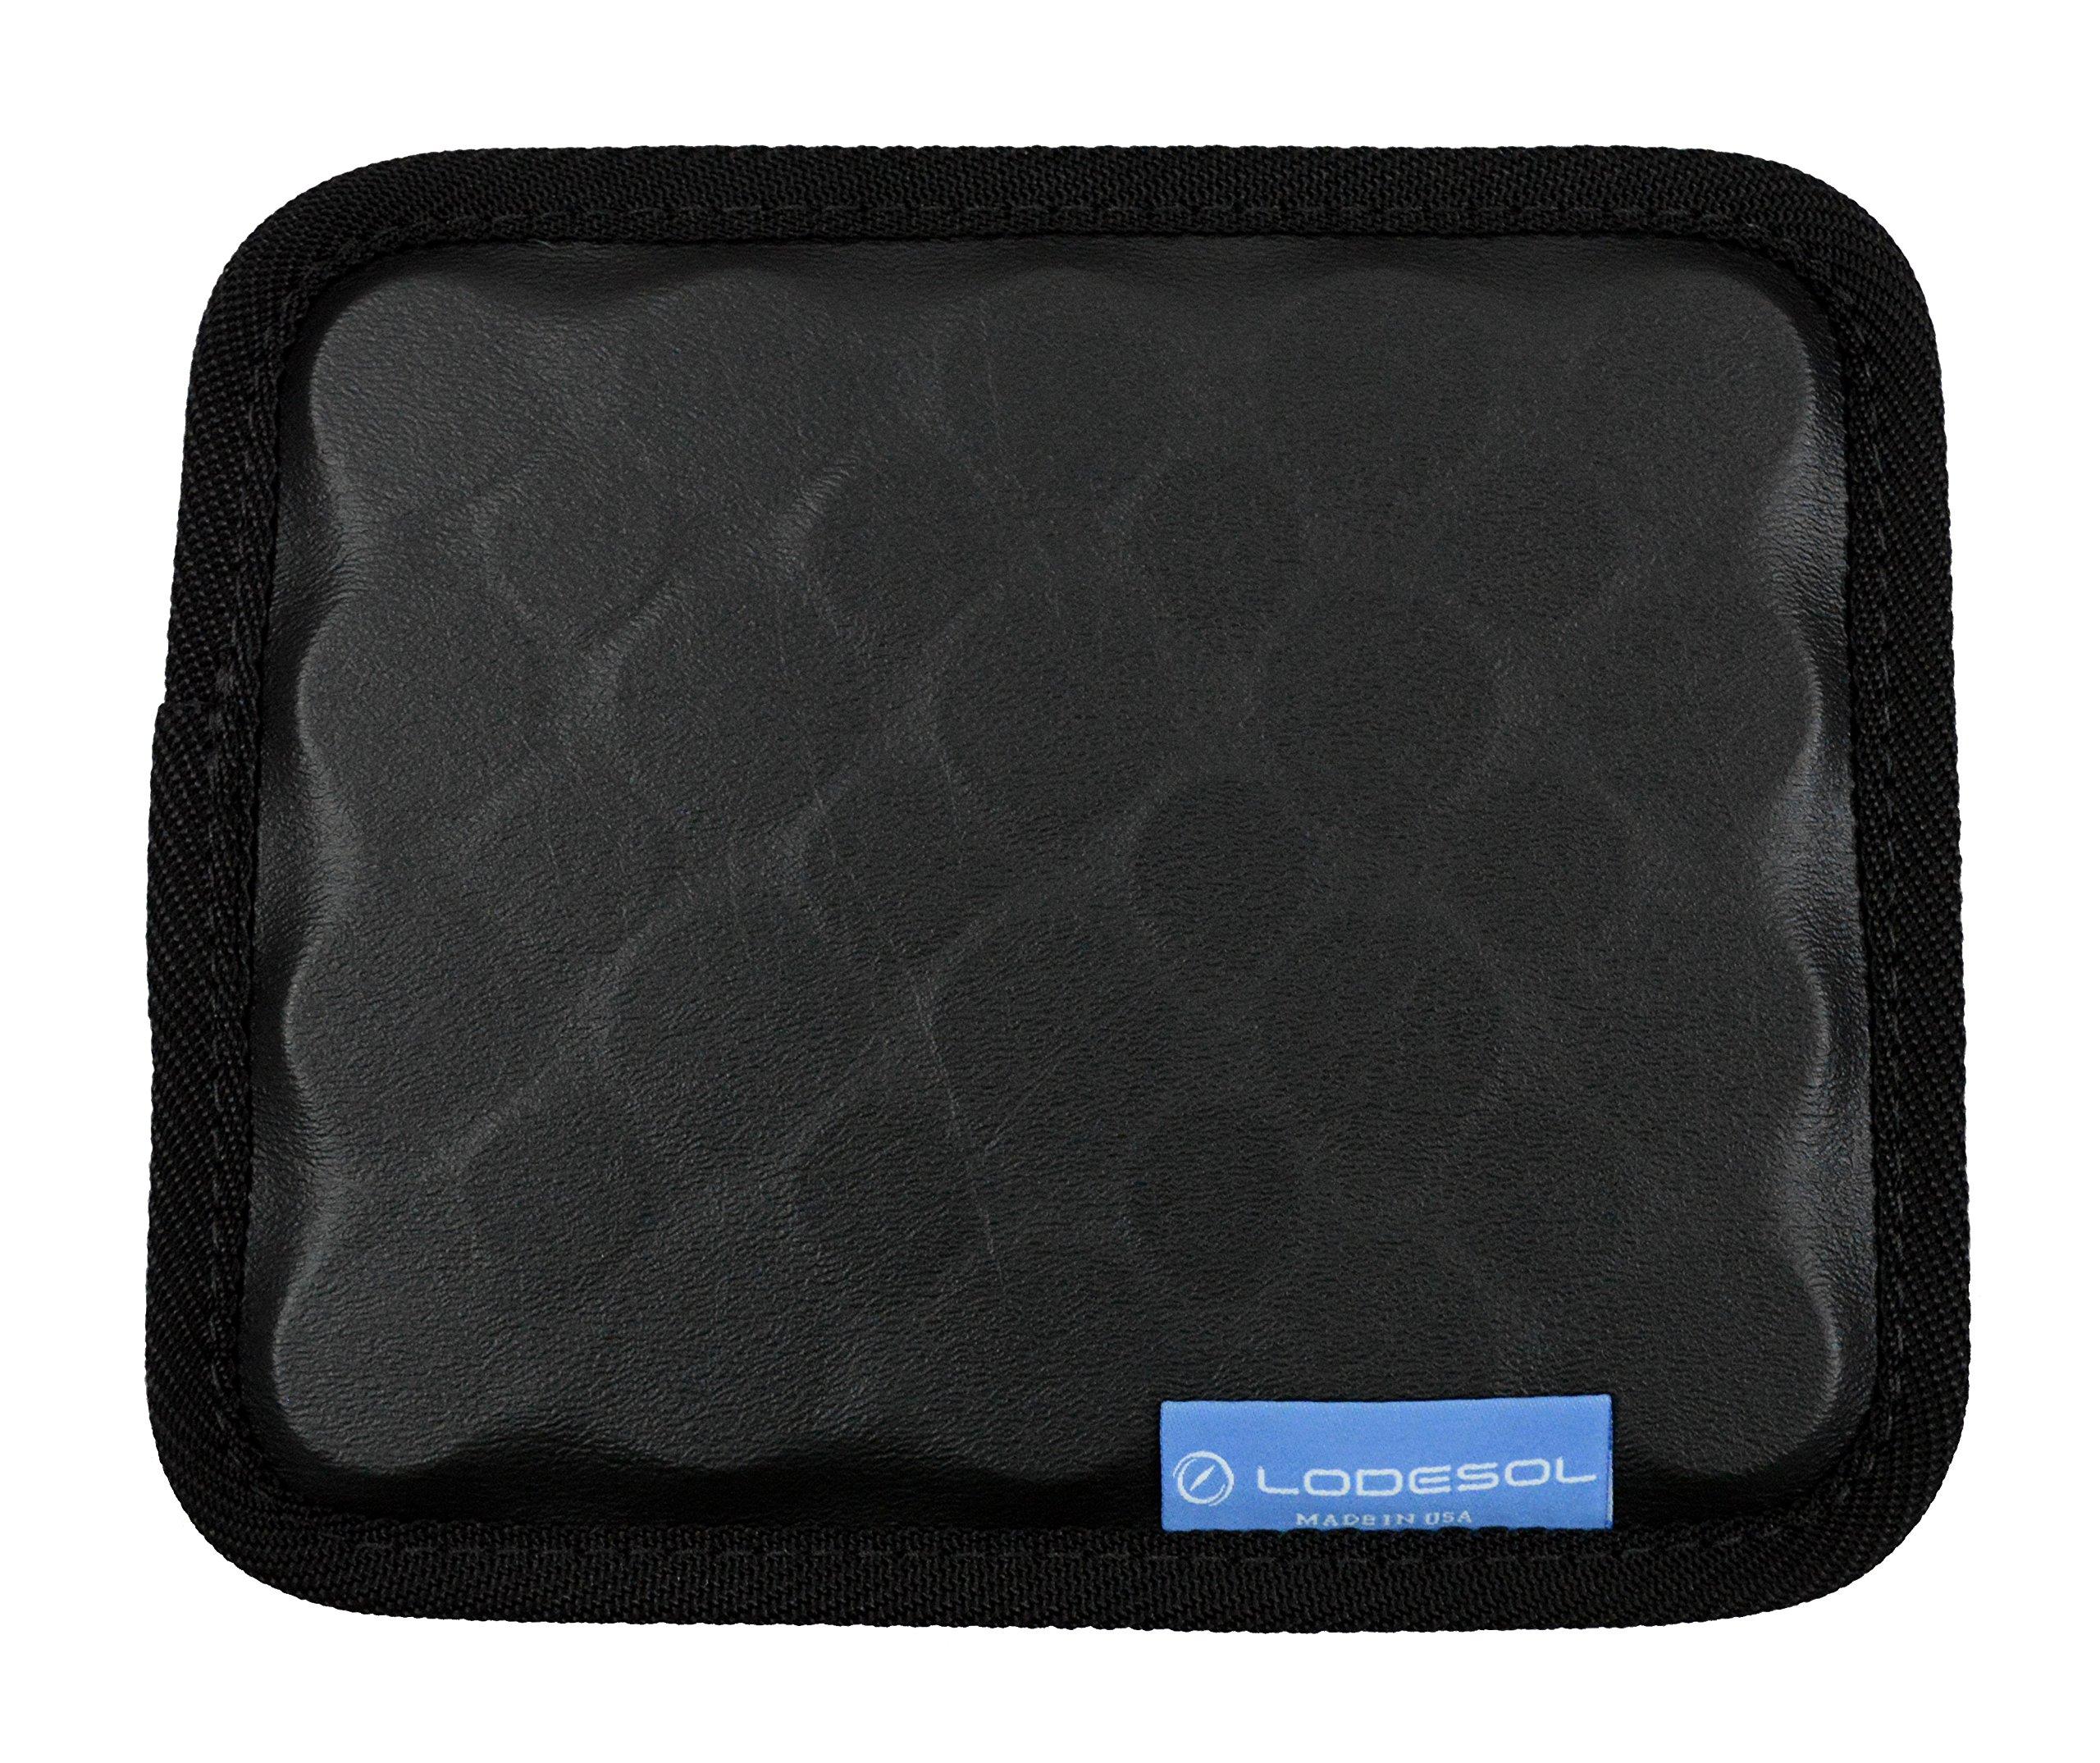 Lodesol Flexible Magnetic Tool Holder 8.25''x6.75'' Mp2012